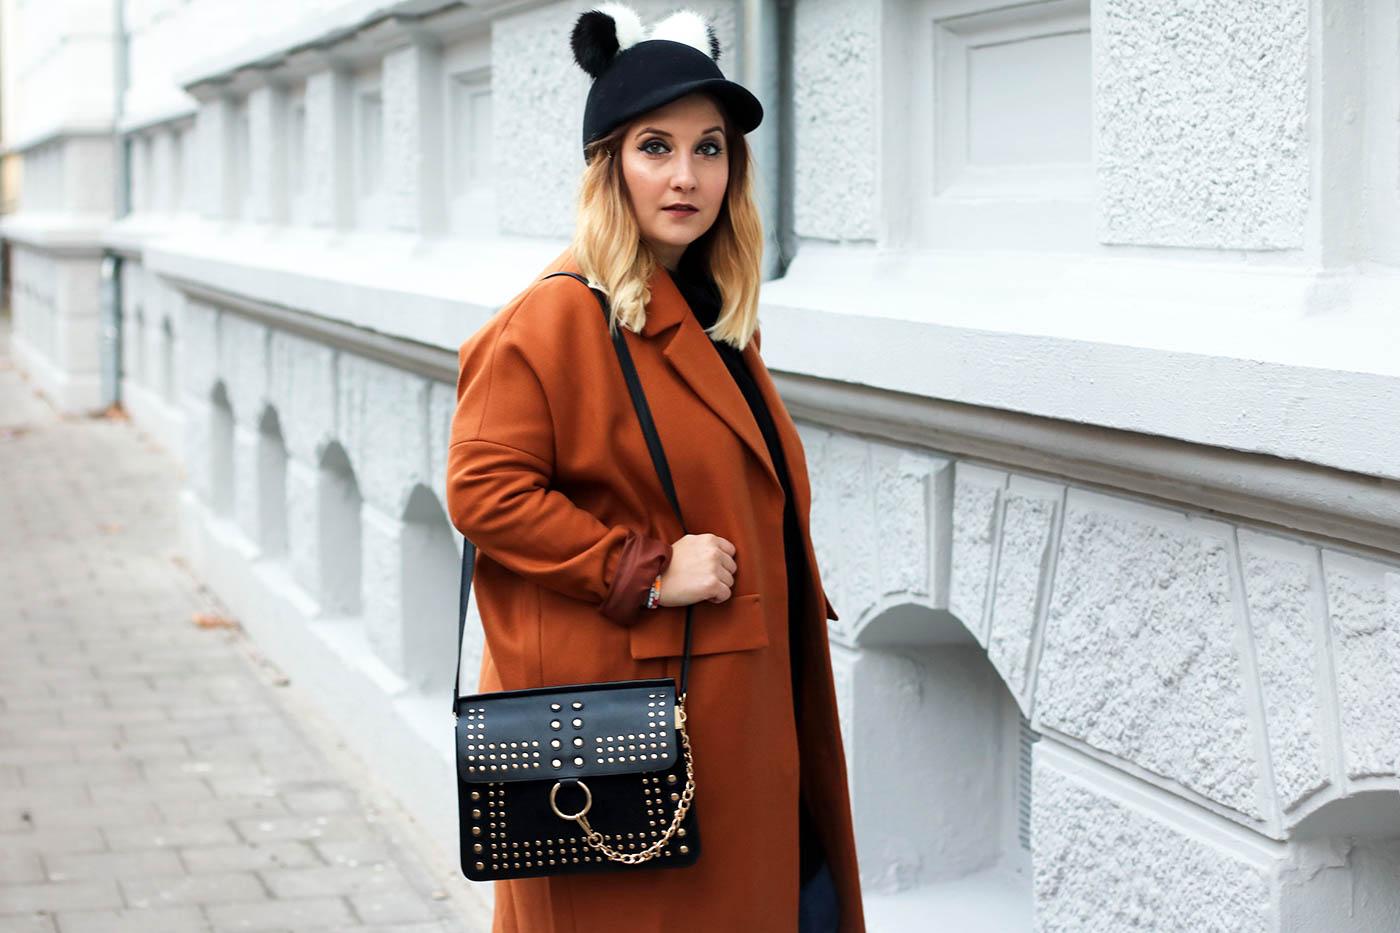 outfit-look-style-mantel-cappe-fashionblog-modeblog-gewinnspiel14